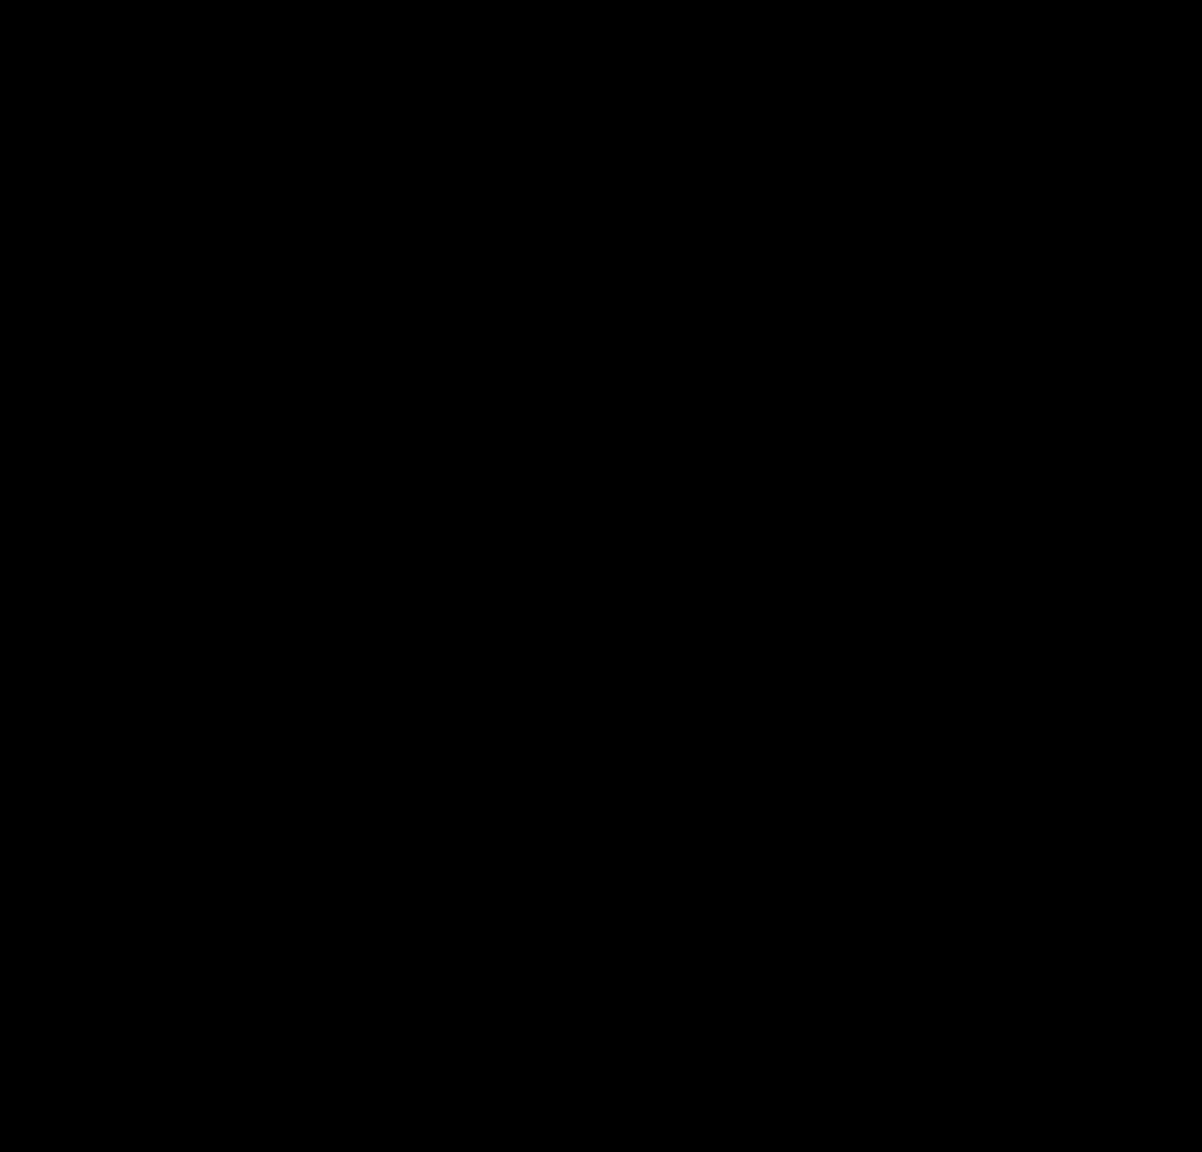 6-(2-Propenyl)ergoline-8-carboxylic acid methyl ester